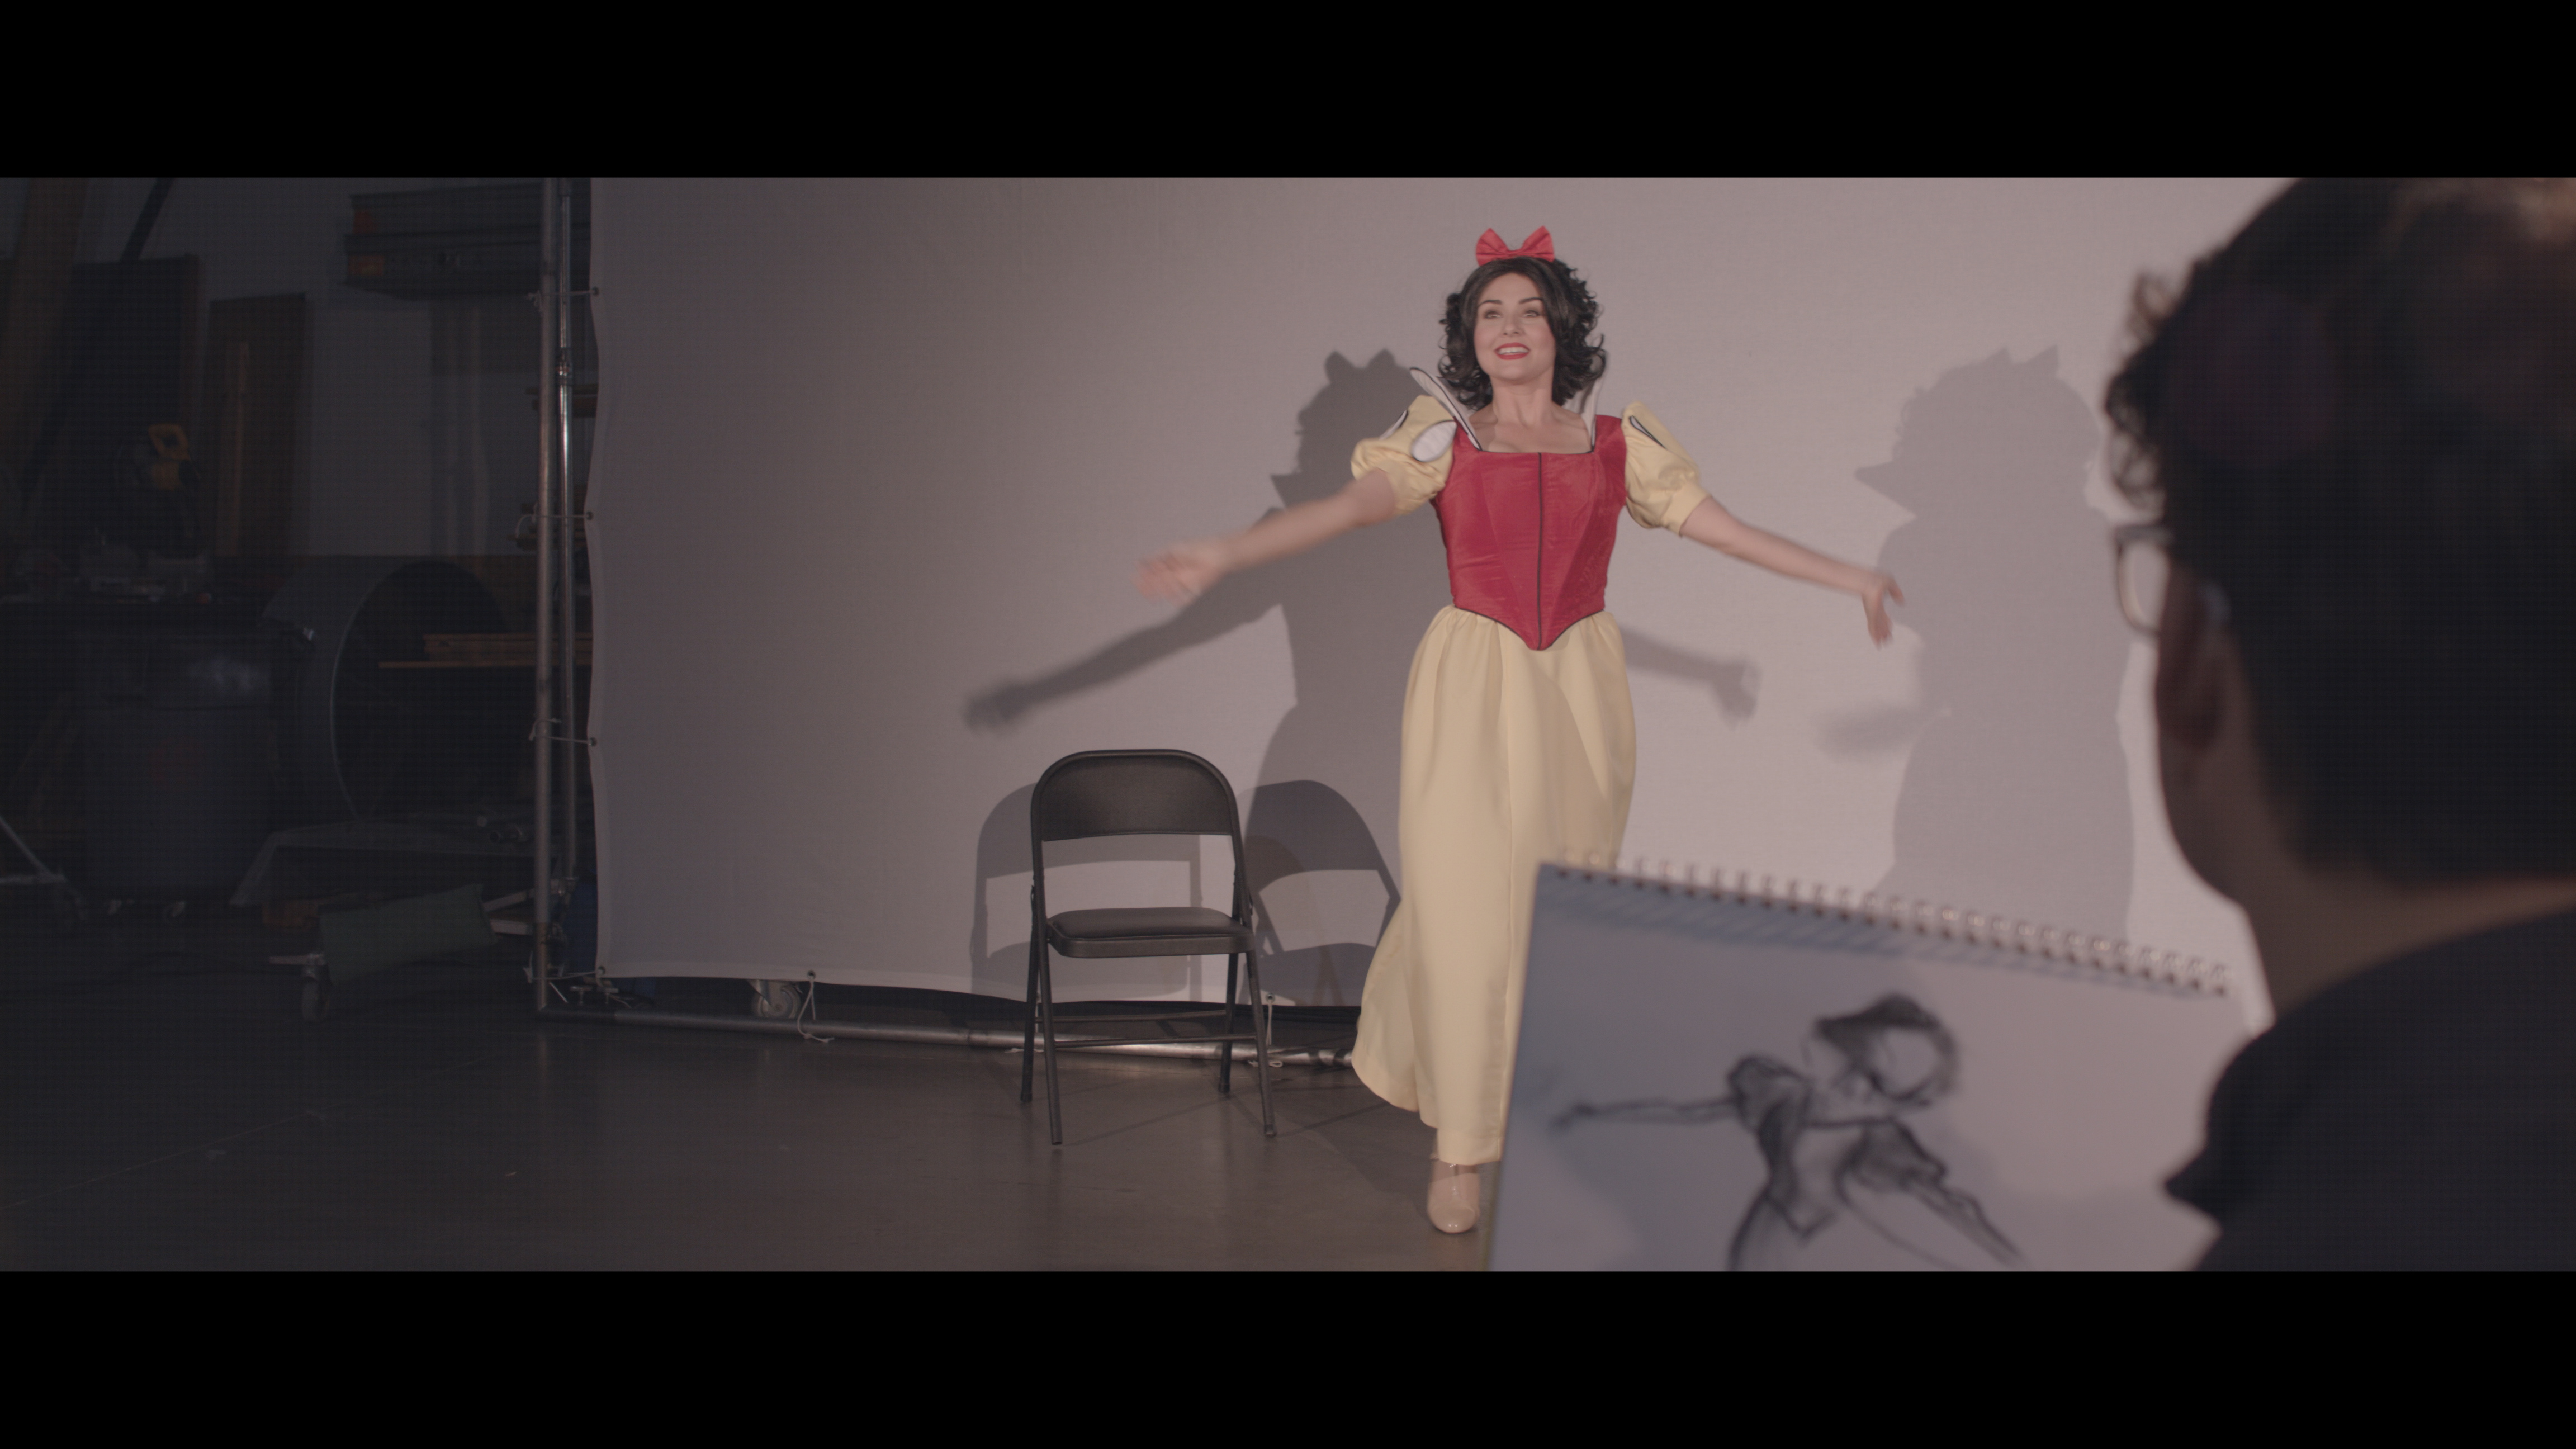 snow white refernce